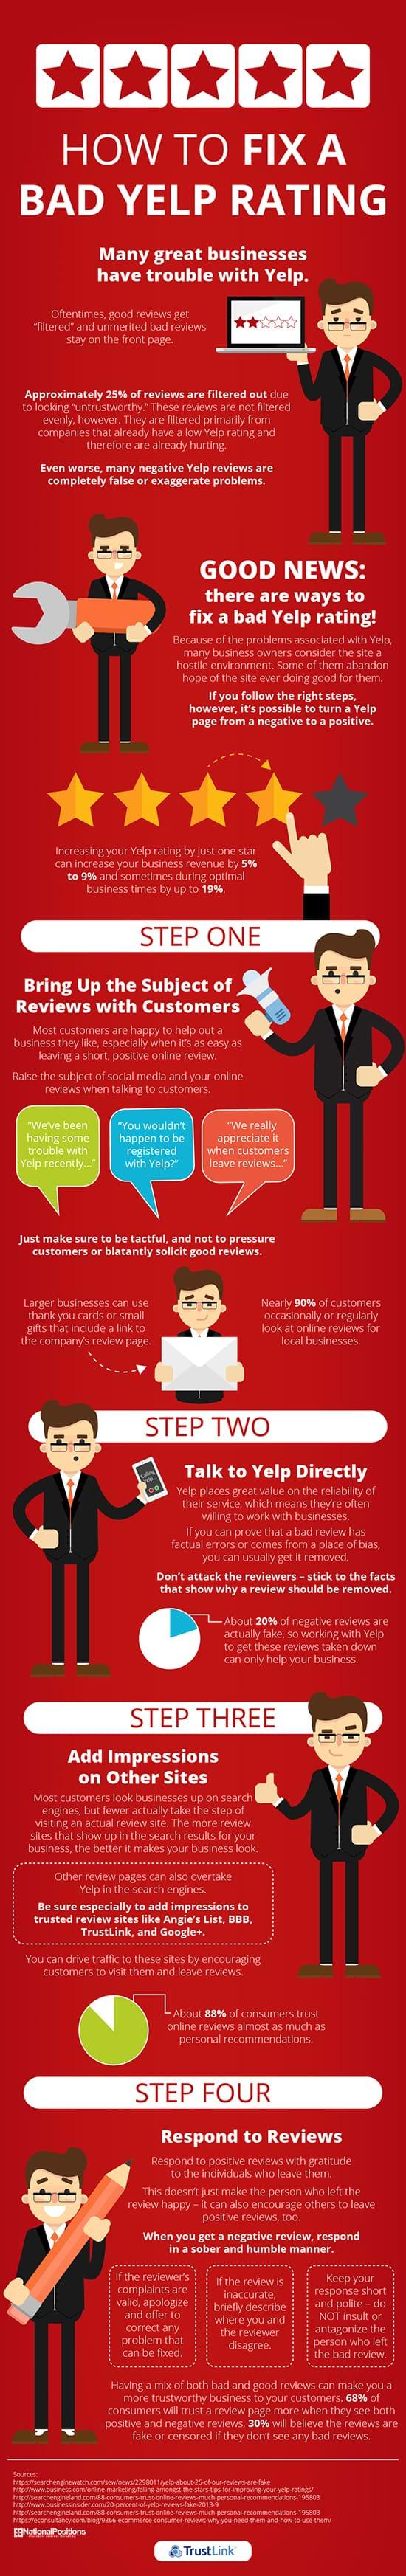 http://trustlink.httpwww.trustlink.org/Images/how-to-fix-a-bad-yelp-rating-sml.jpg